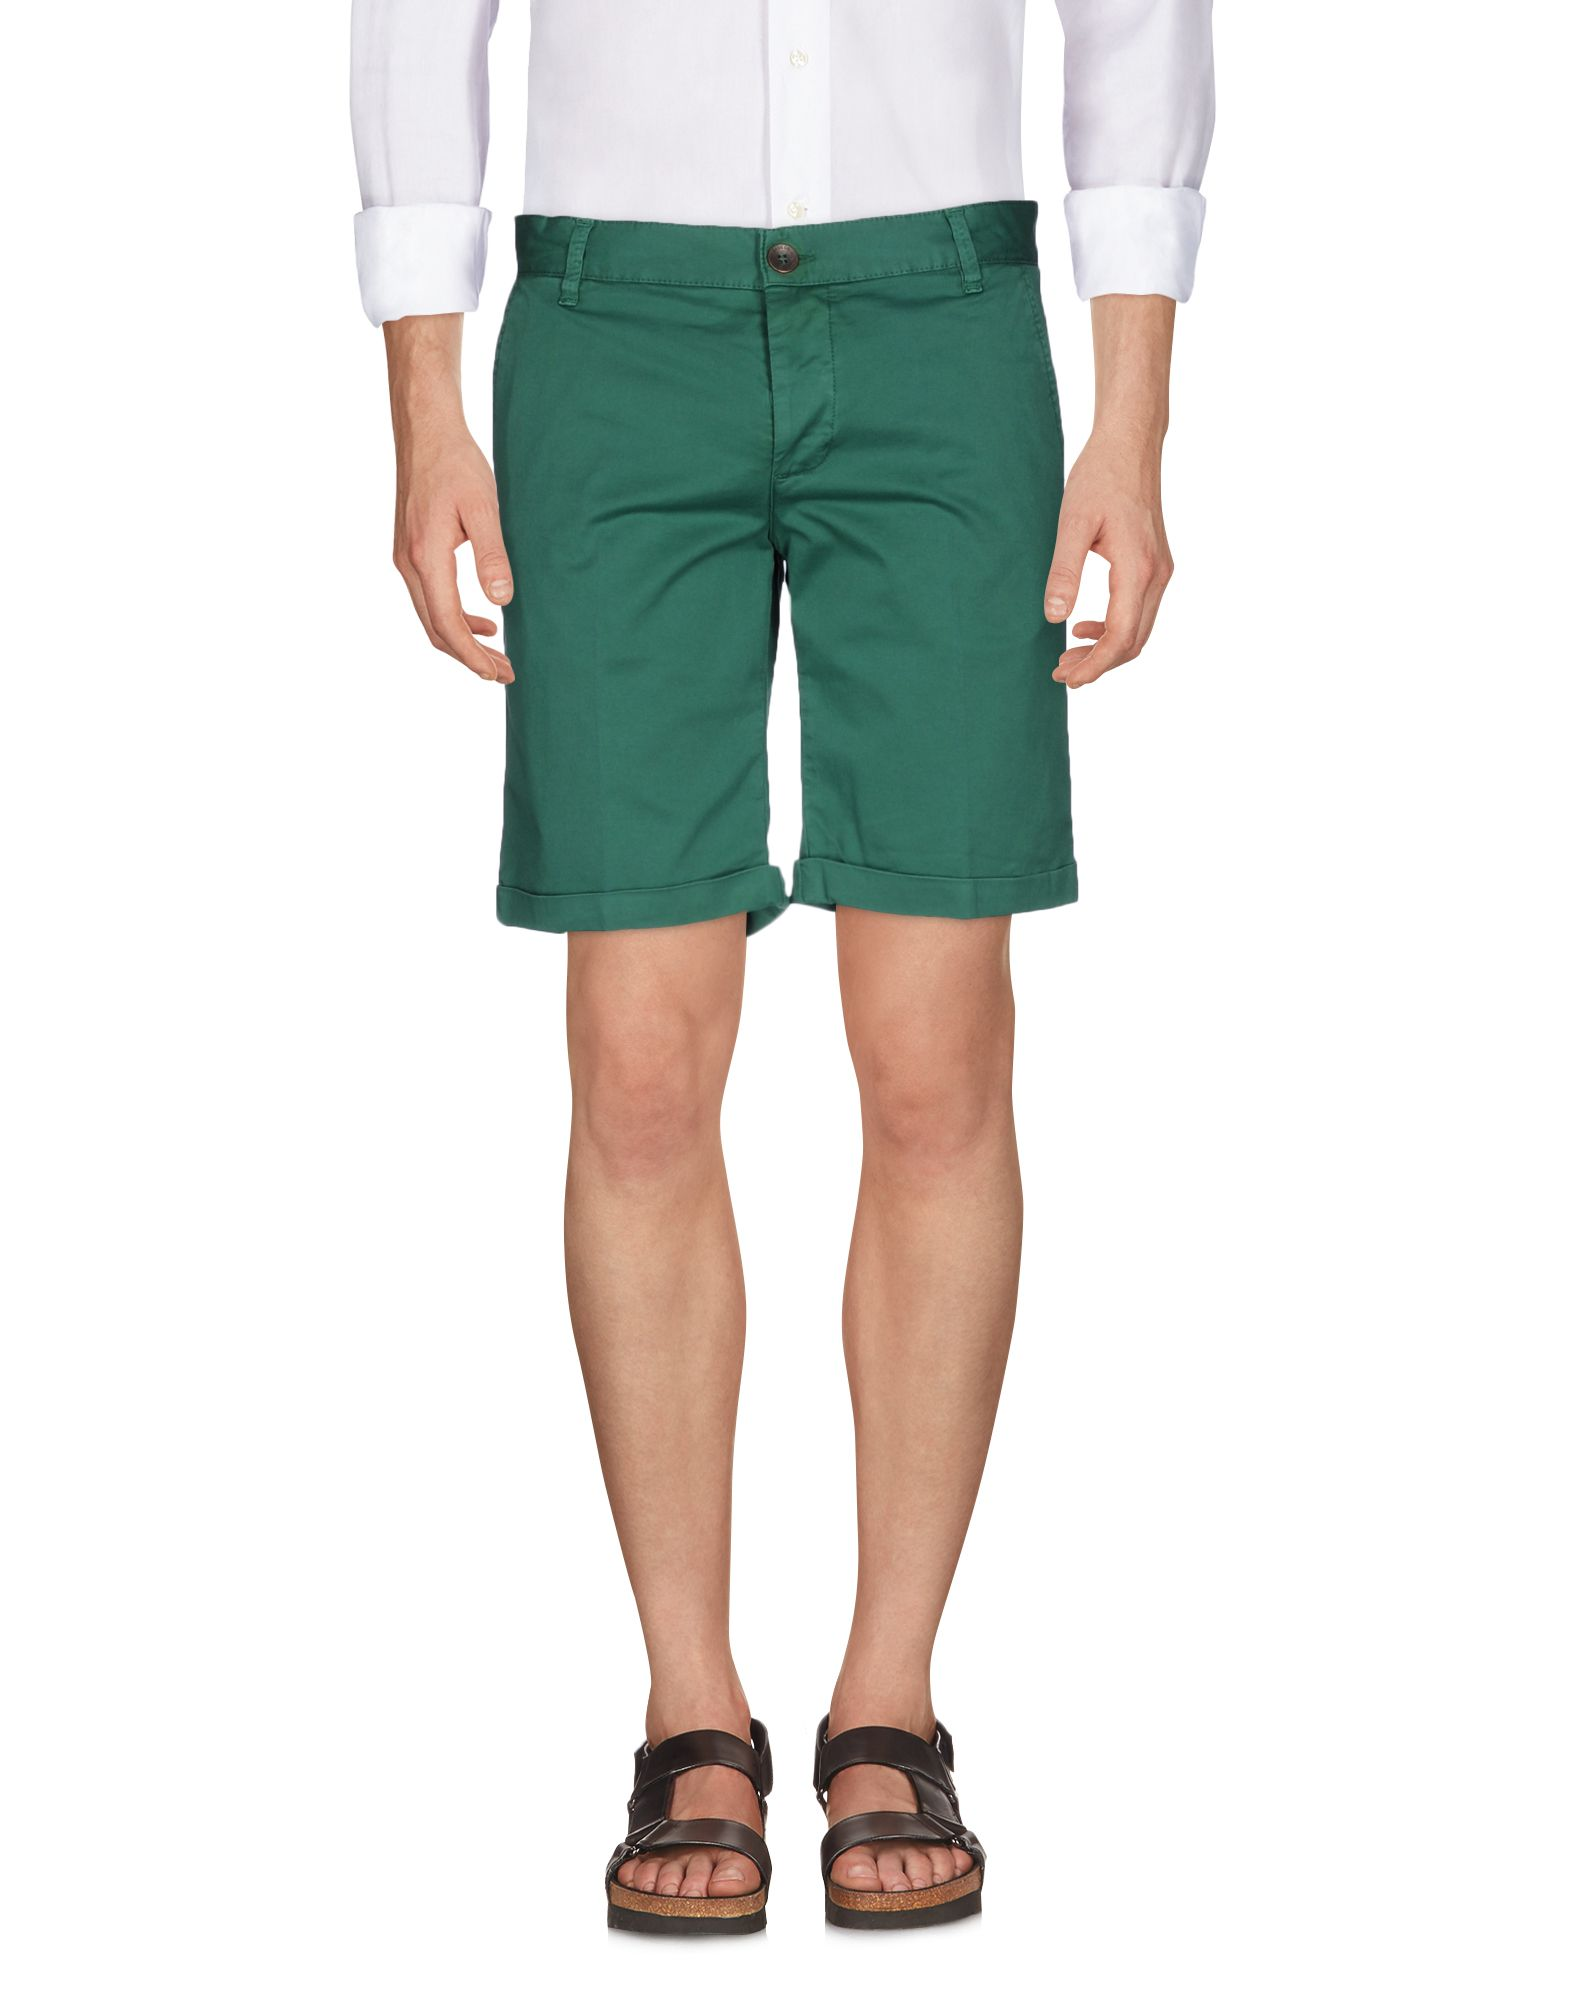 Shorts & Bermuda Uomo Basicon Uomo Bermuda - 36988312ML 025a39